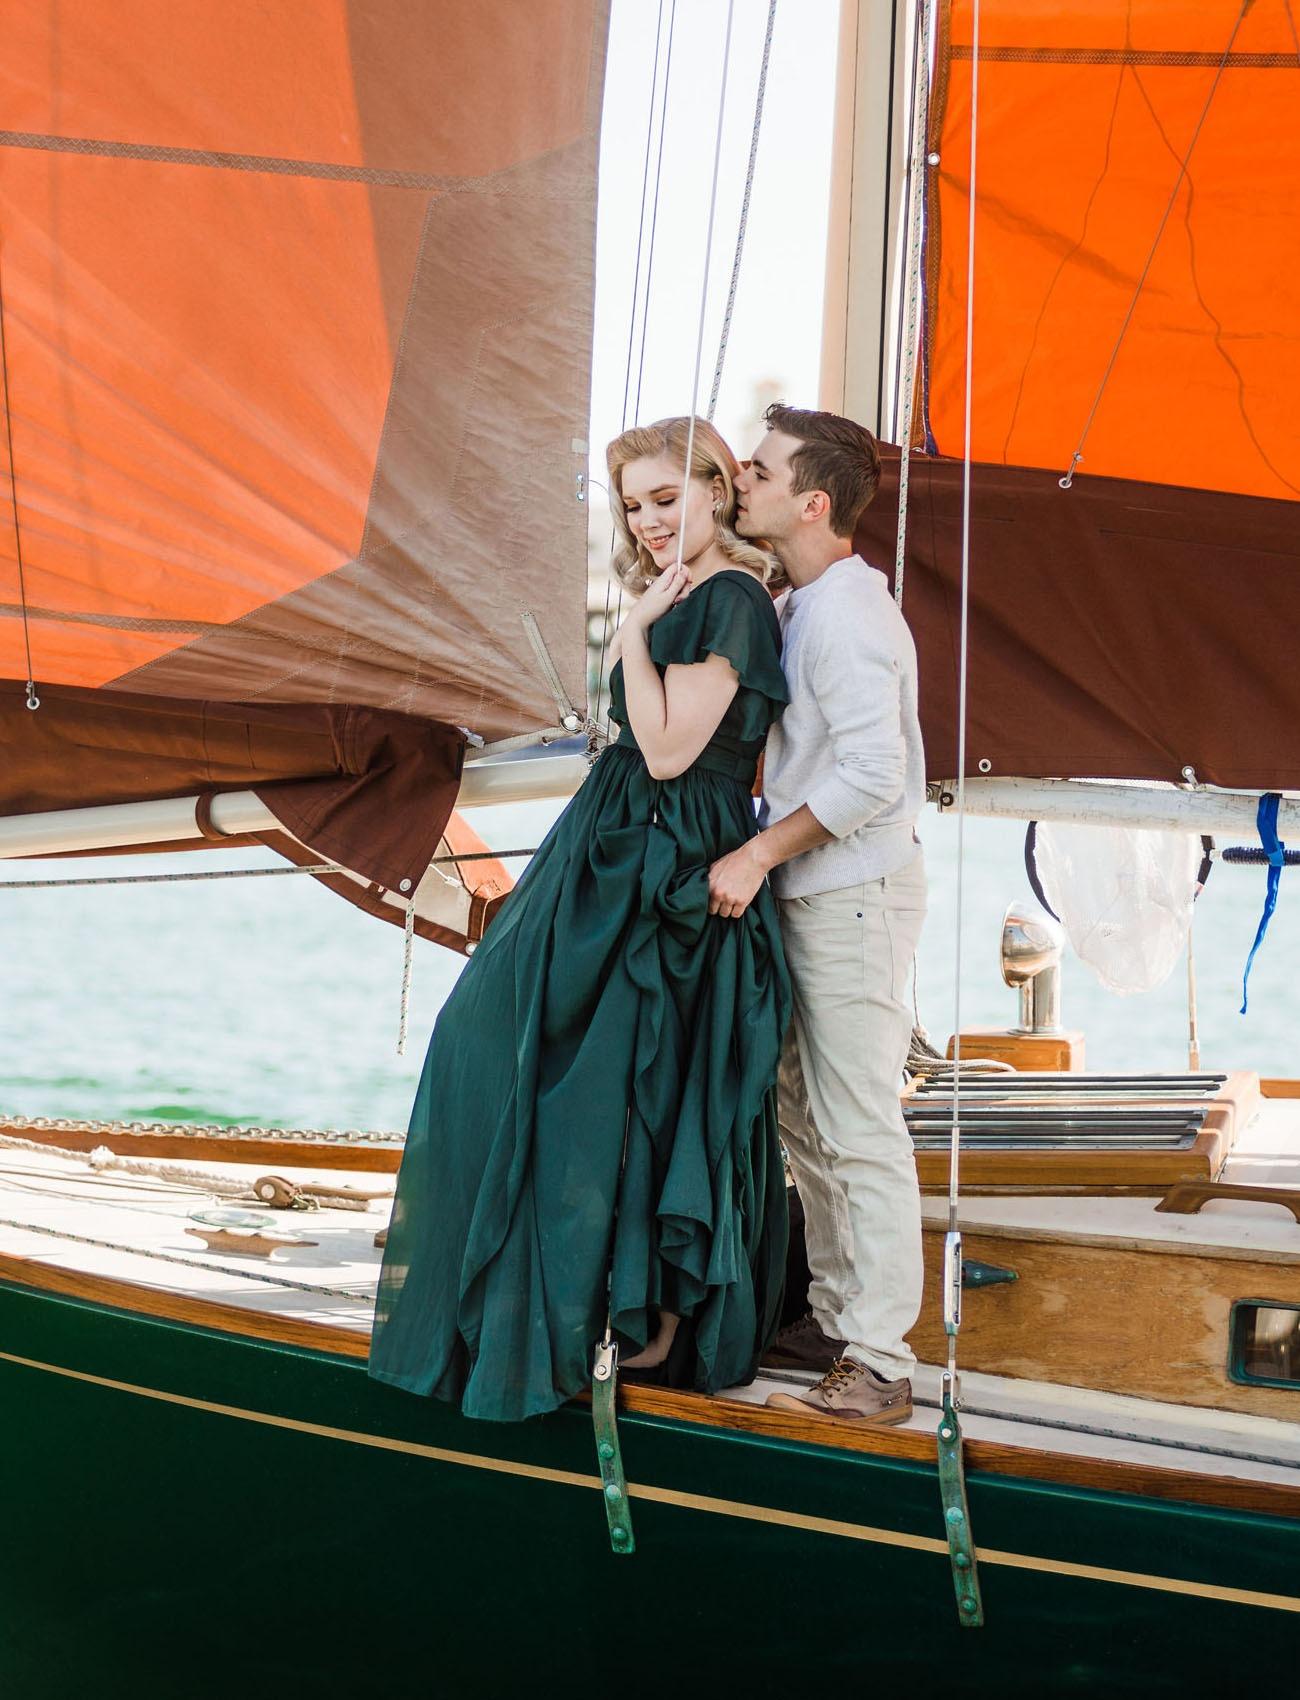 couple enjoying their honeymoon in Newport Beach California USA